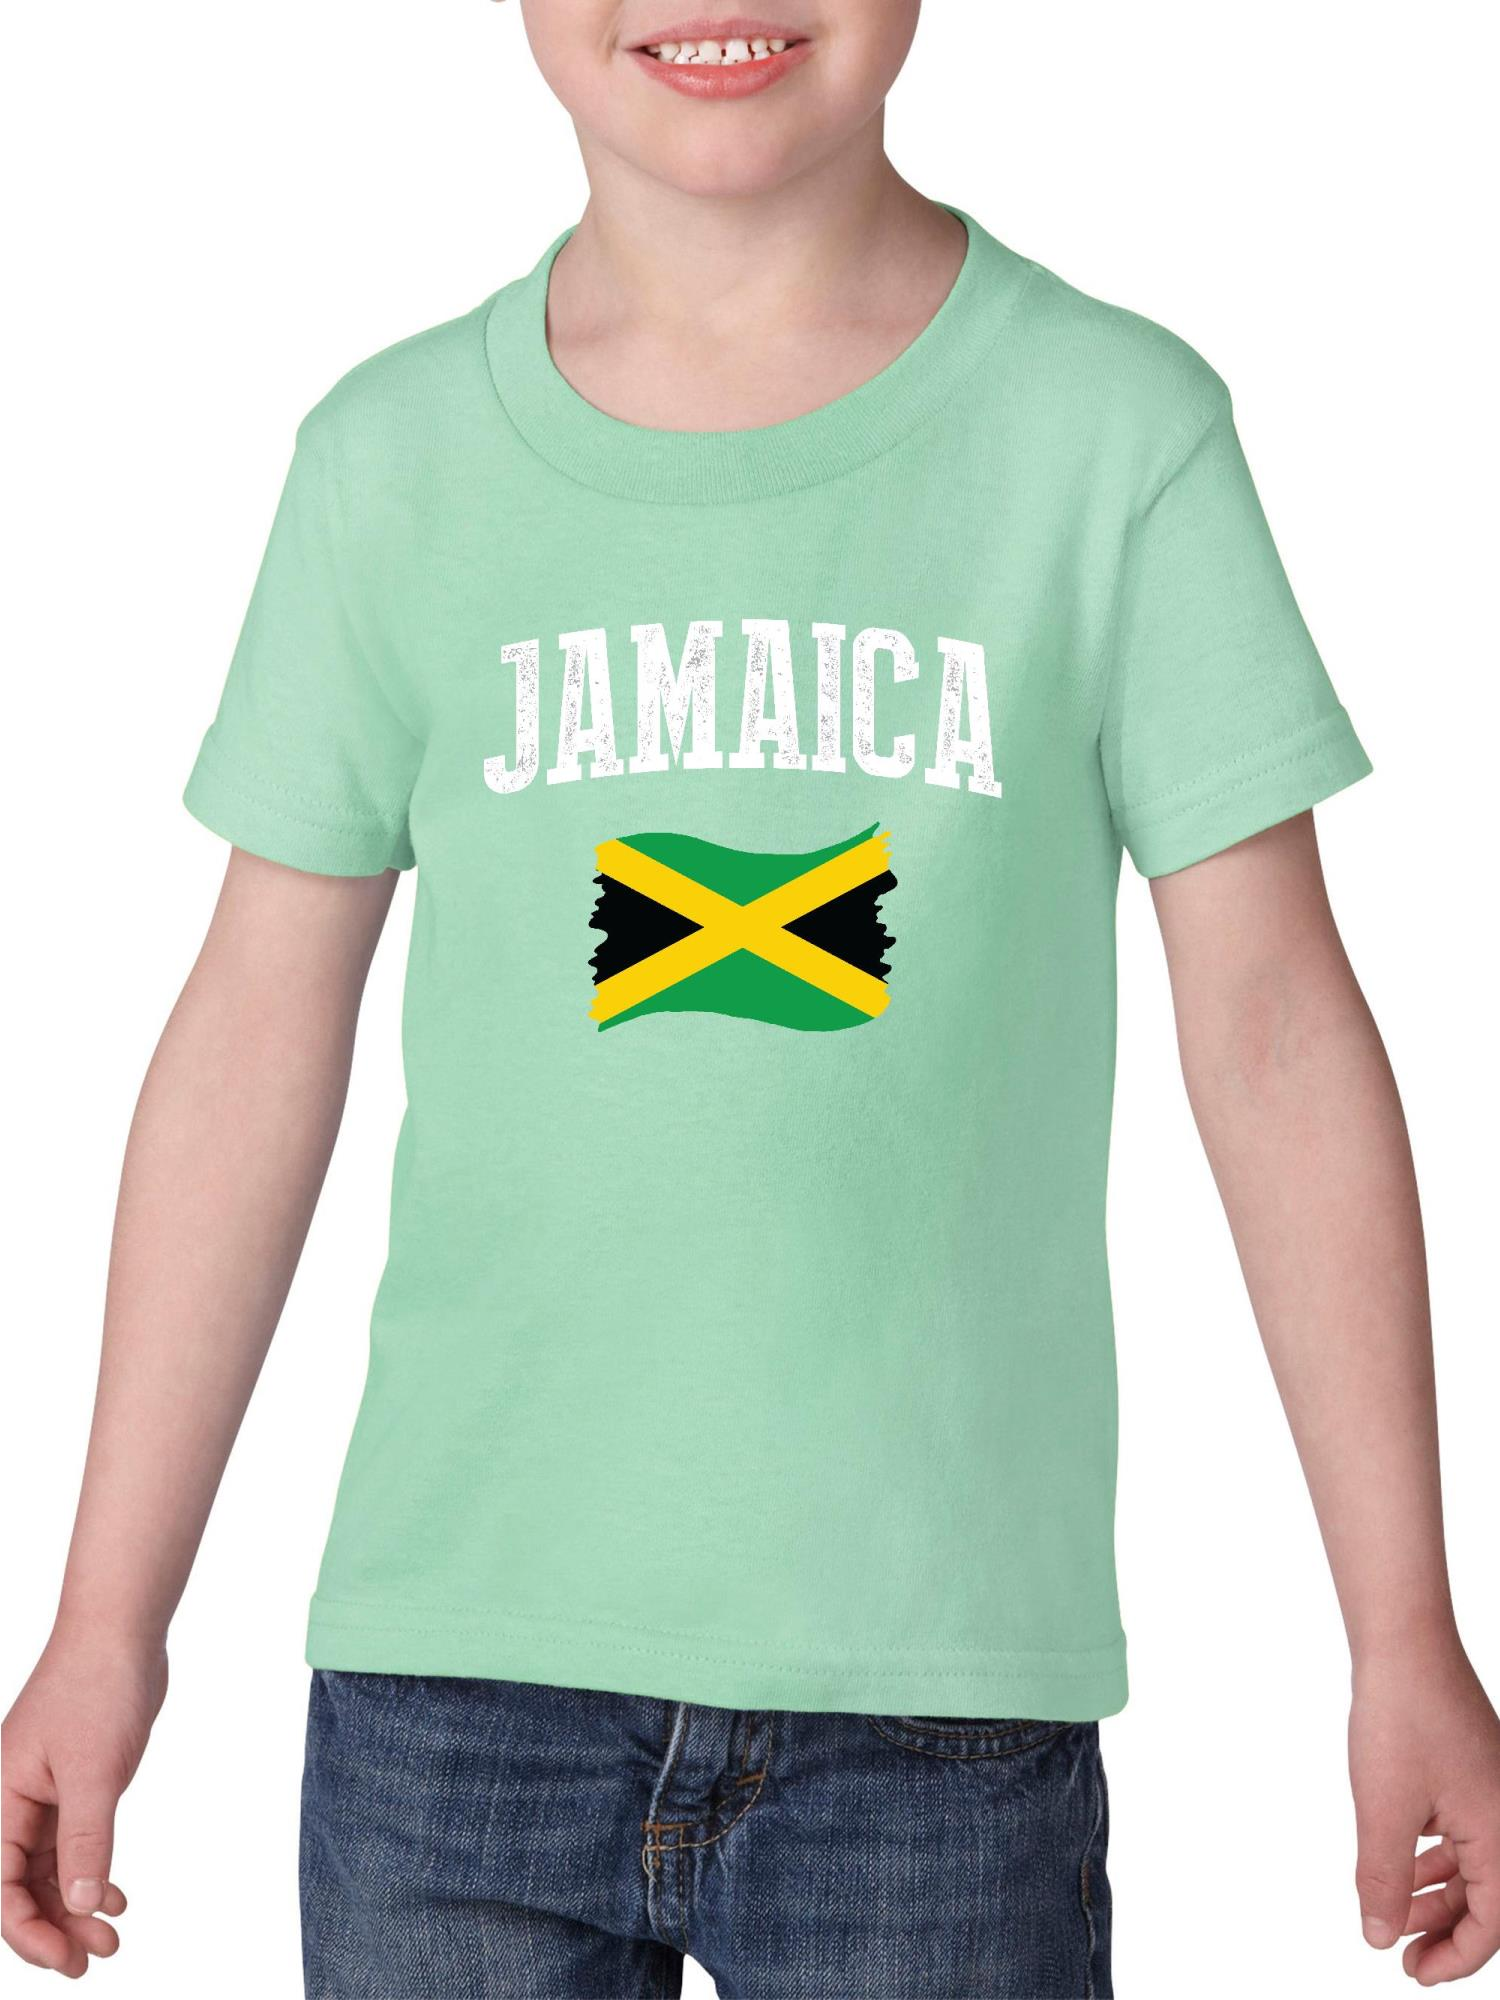 Jamaica Heavy Cotton Toddler Kids T-Shirt Tee Clothing